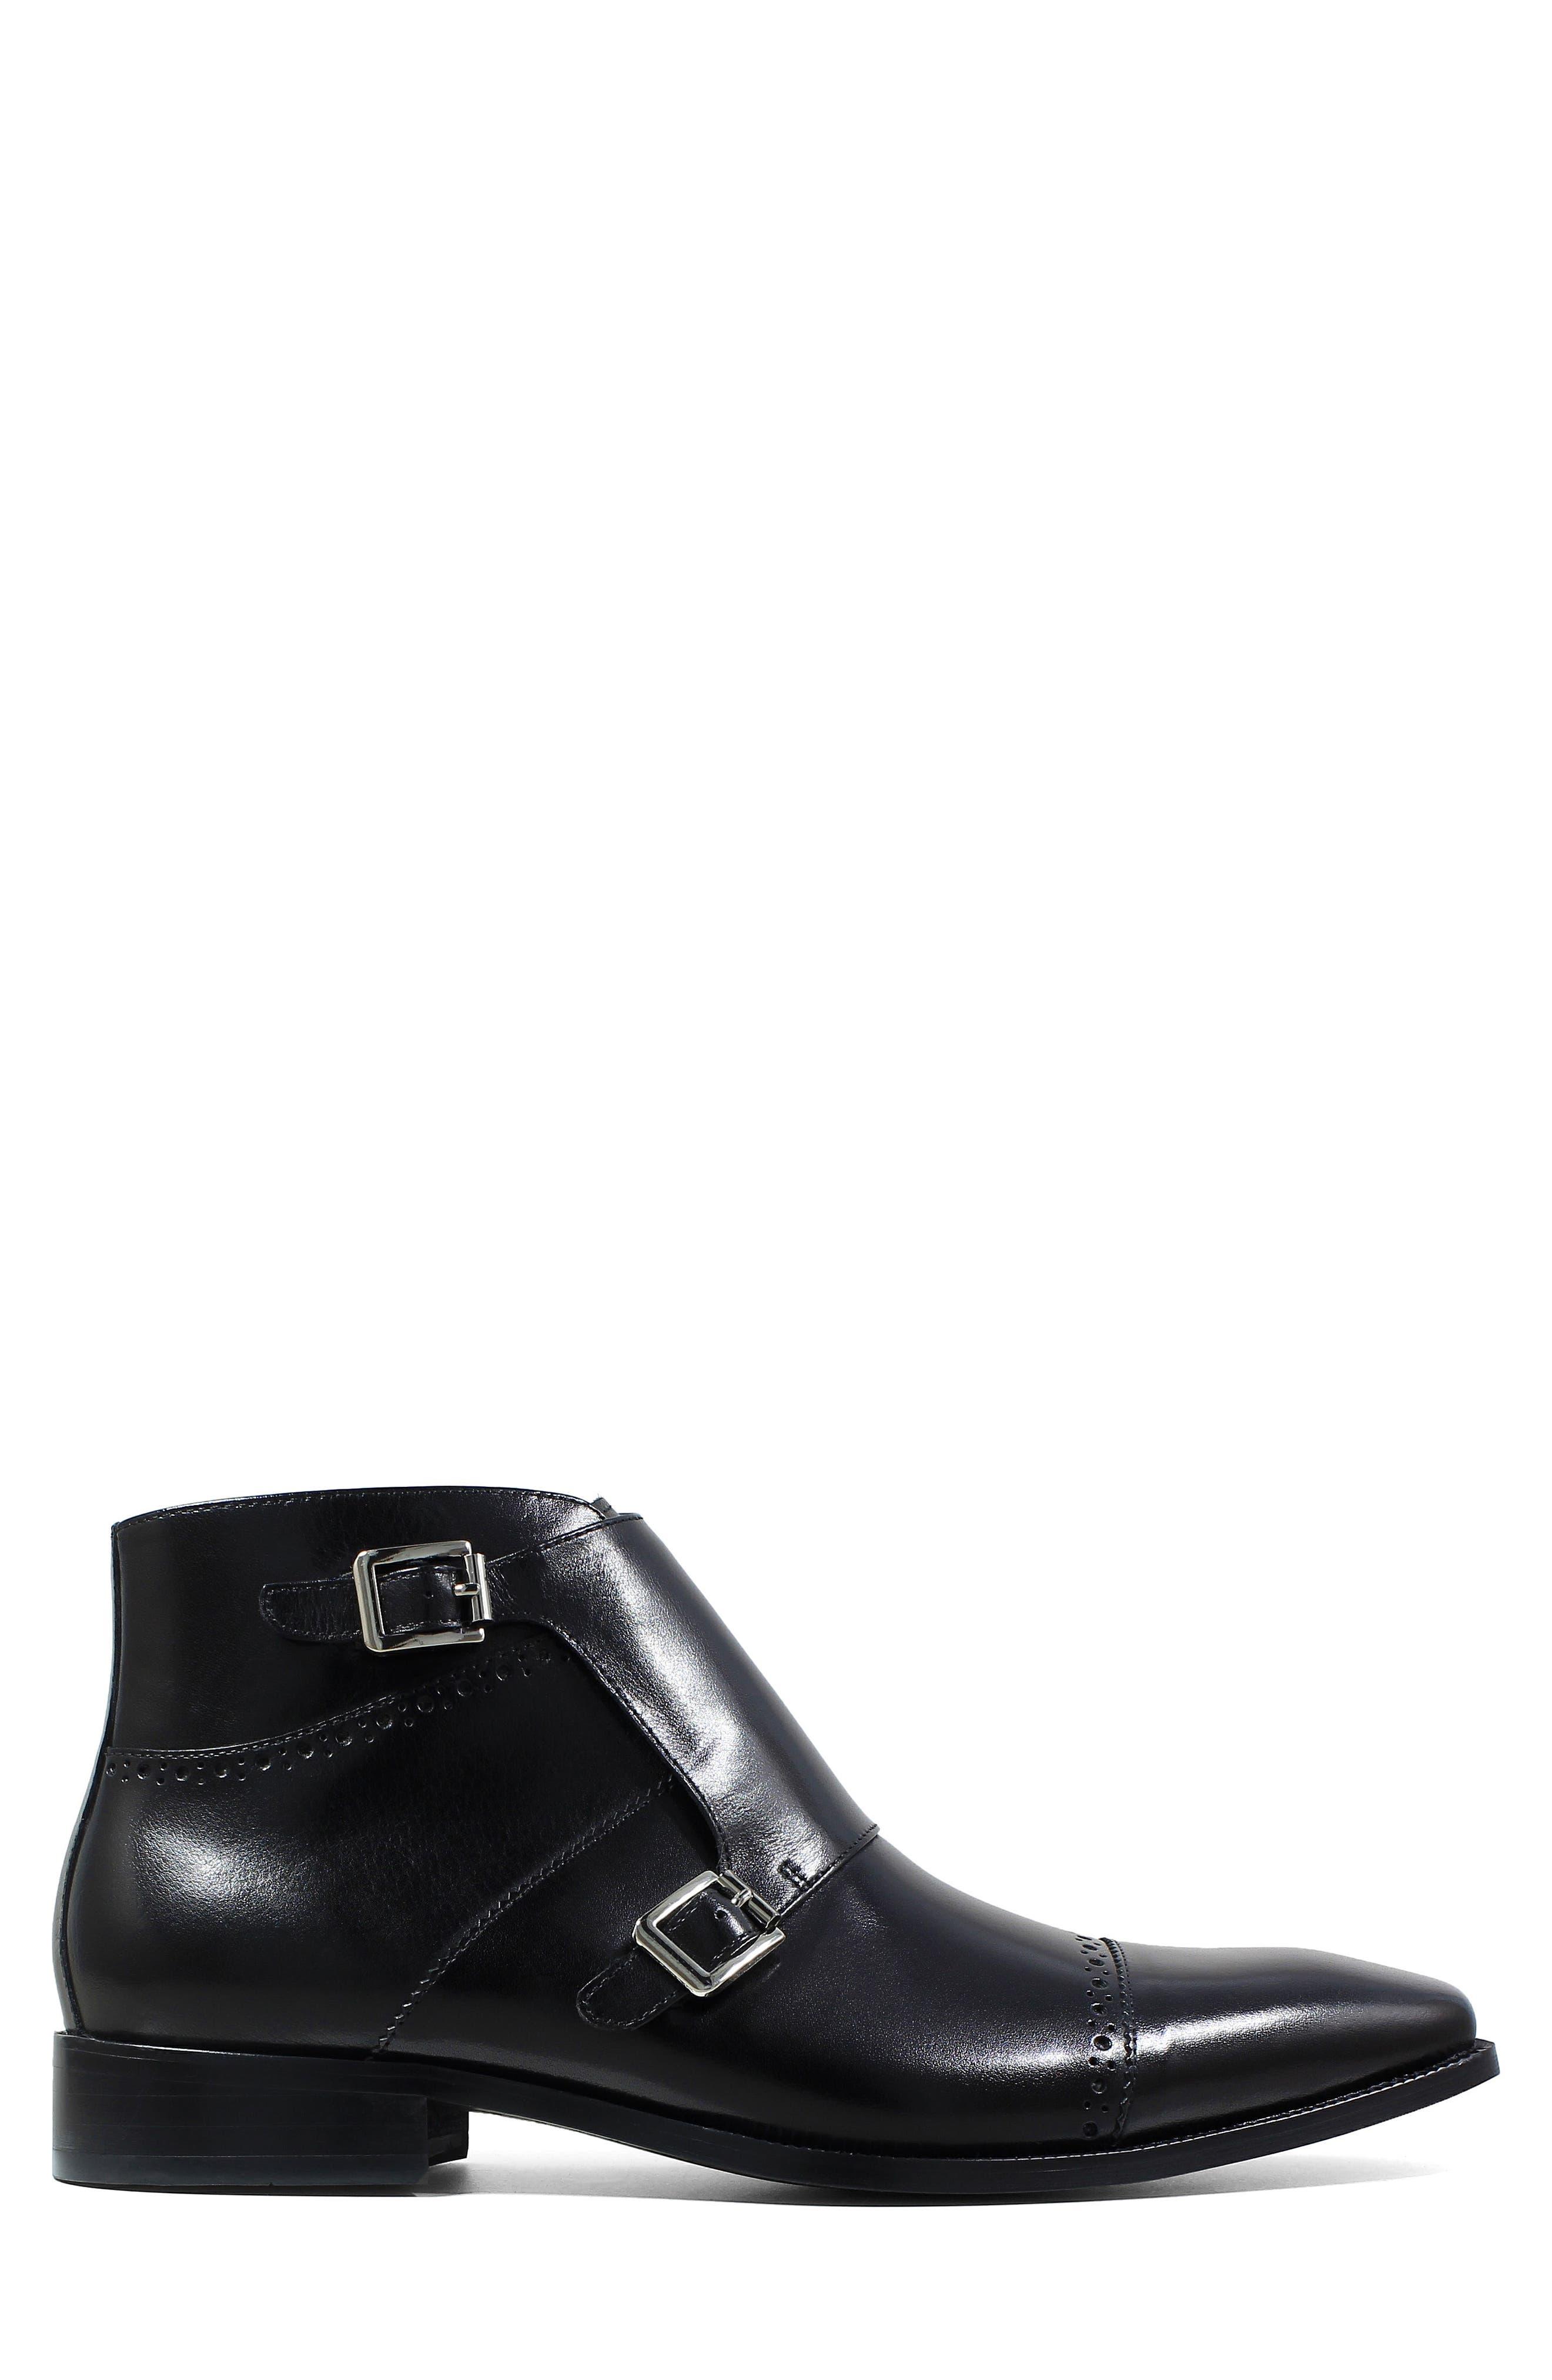 Kason Double Monk Strap Boot,                             Alternate thumbnail 3, color,                             Black Leather